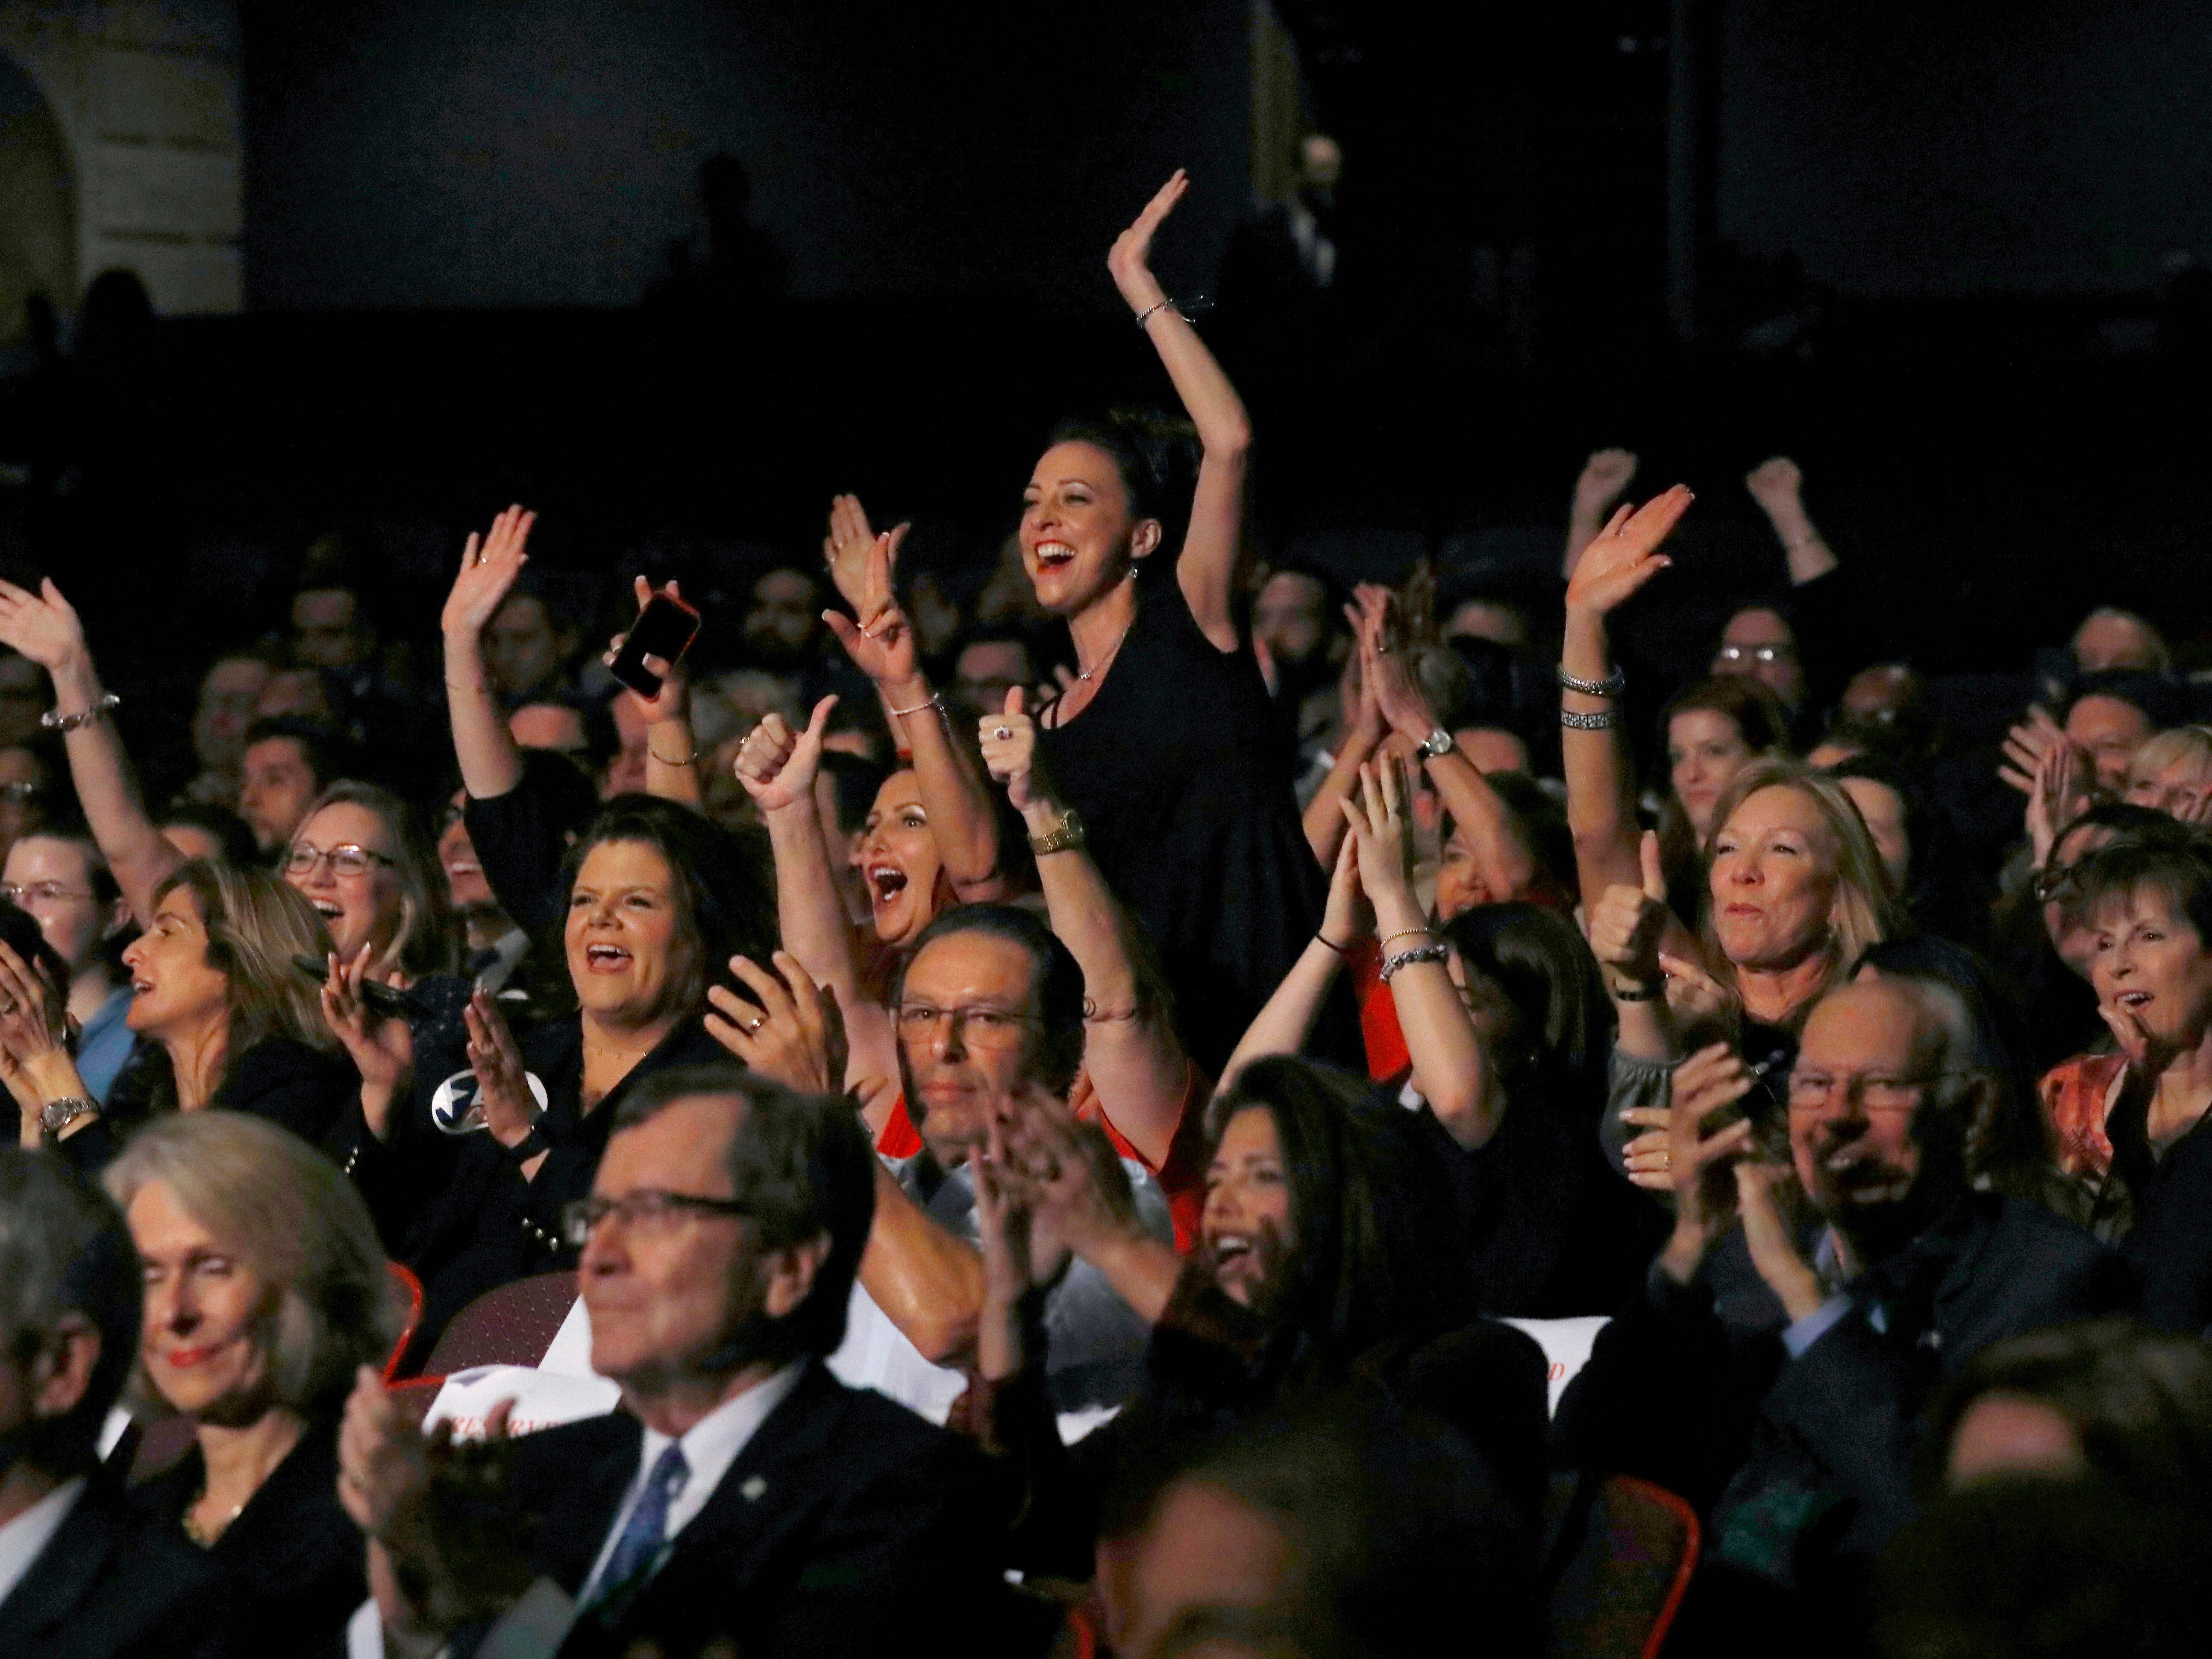 Members of the audience cheer as Republican U.S. Senator Ted Cruz and Democratic U.S. Representative Beto O'Rourke prepare to take part in their first debate for the Texas U.S. Senate in Dallas, Friday, Sept. 21, 2018. (Tom Fox/The Dallas Morning News via AP, Pool)